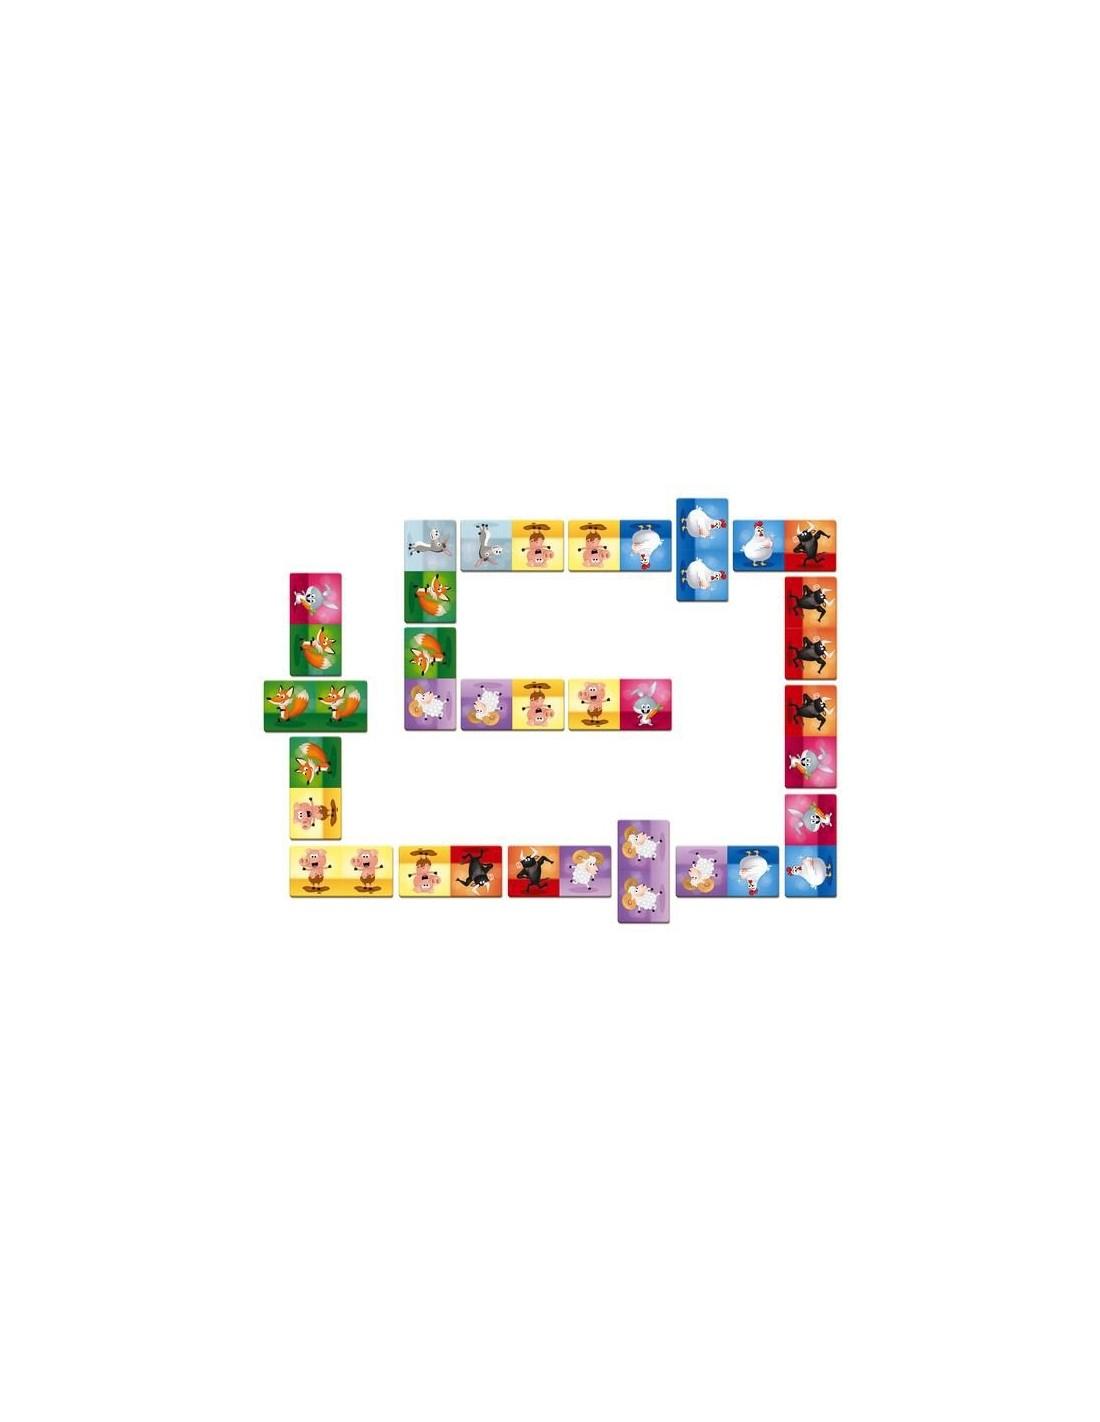 Jeu Dominos Rigolooo - Janod serapportantà Jeux Domino Gratuit En Ligne